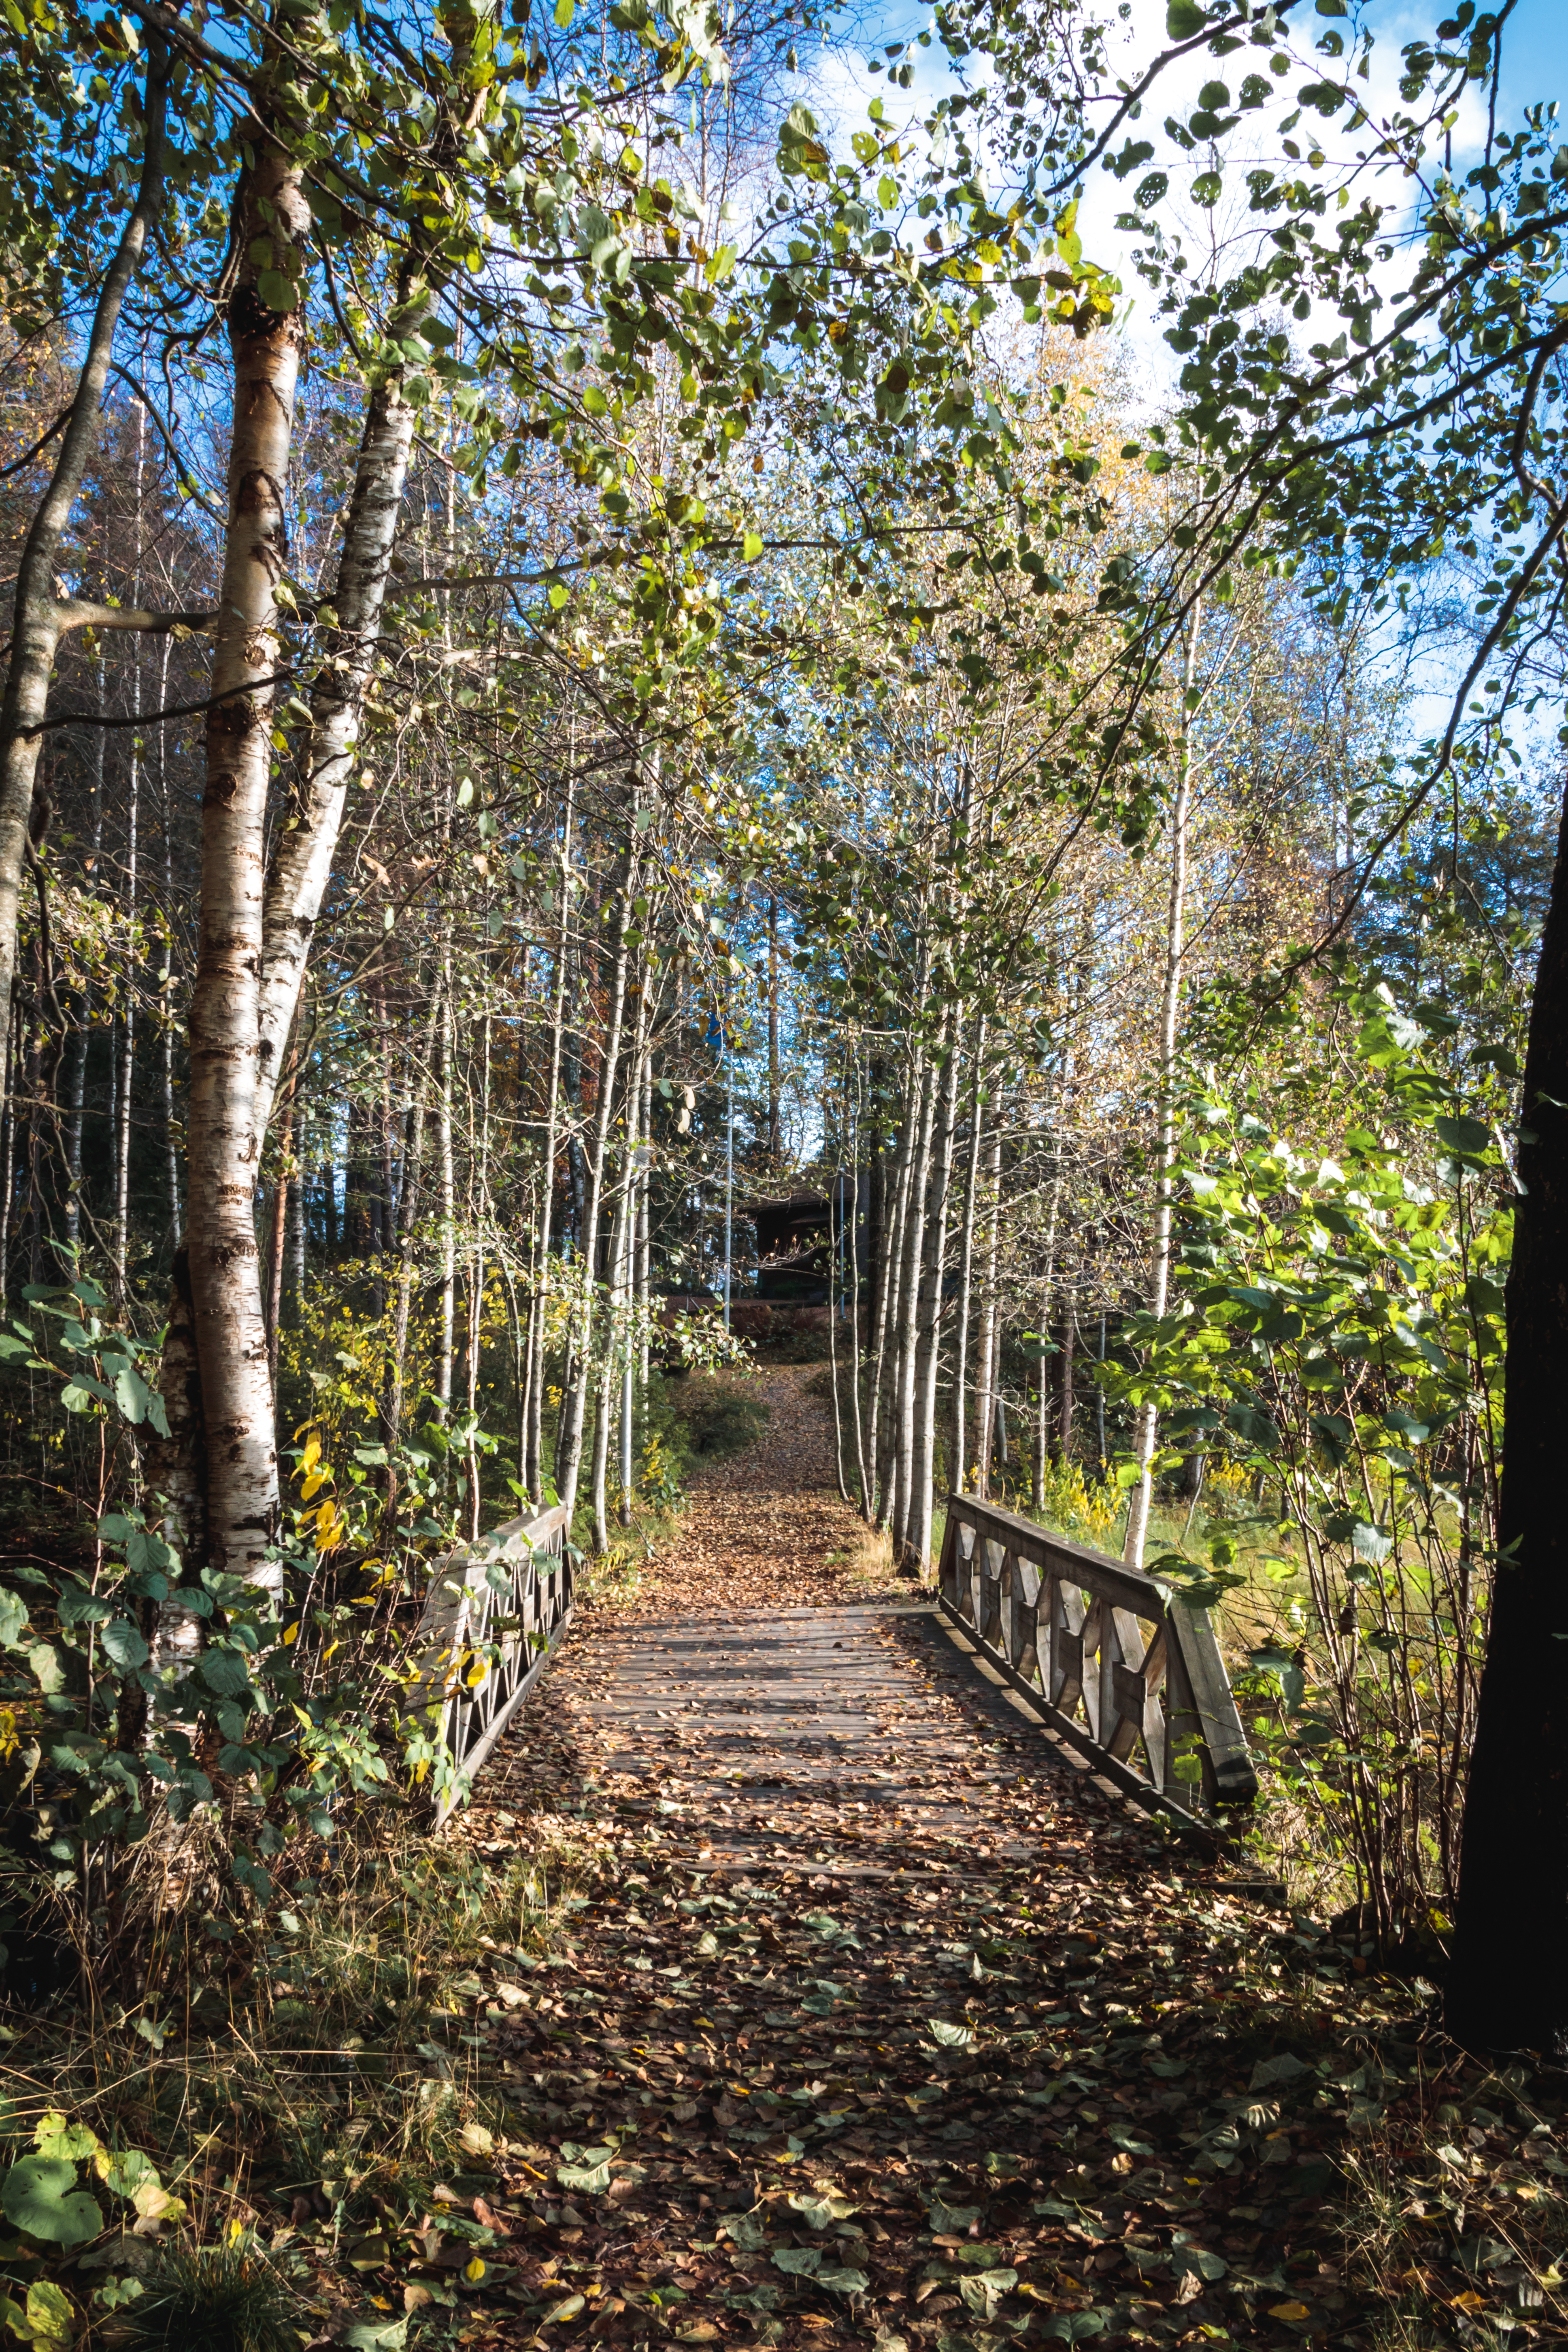 Saaren kansanpuisto, tammela, finland photo